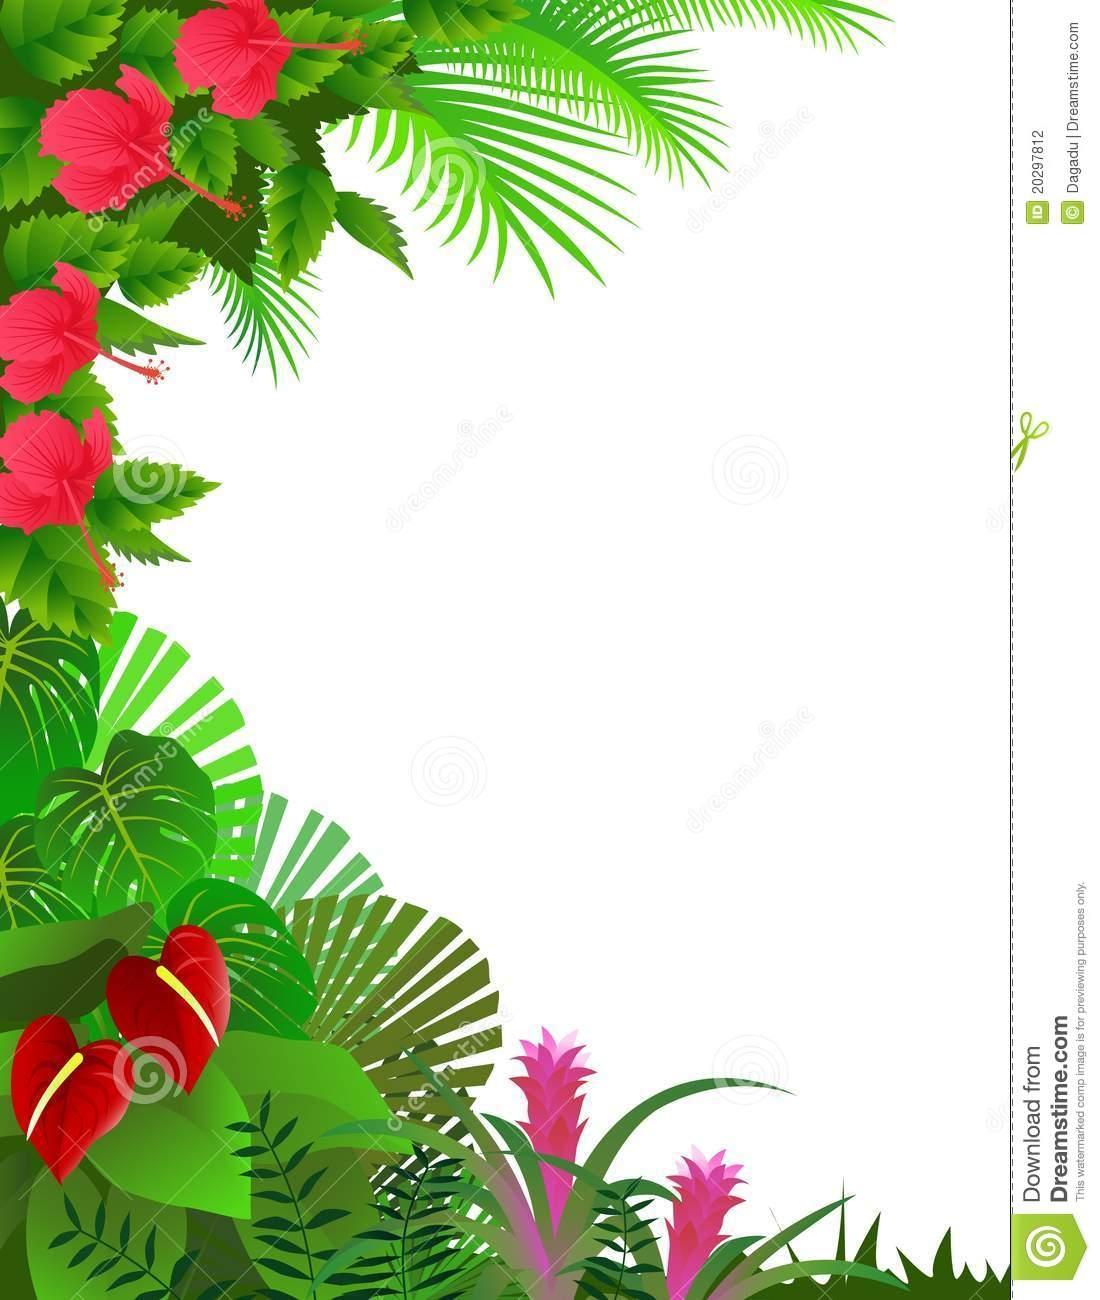 1100x1300 Rainforest Background Clipart Border